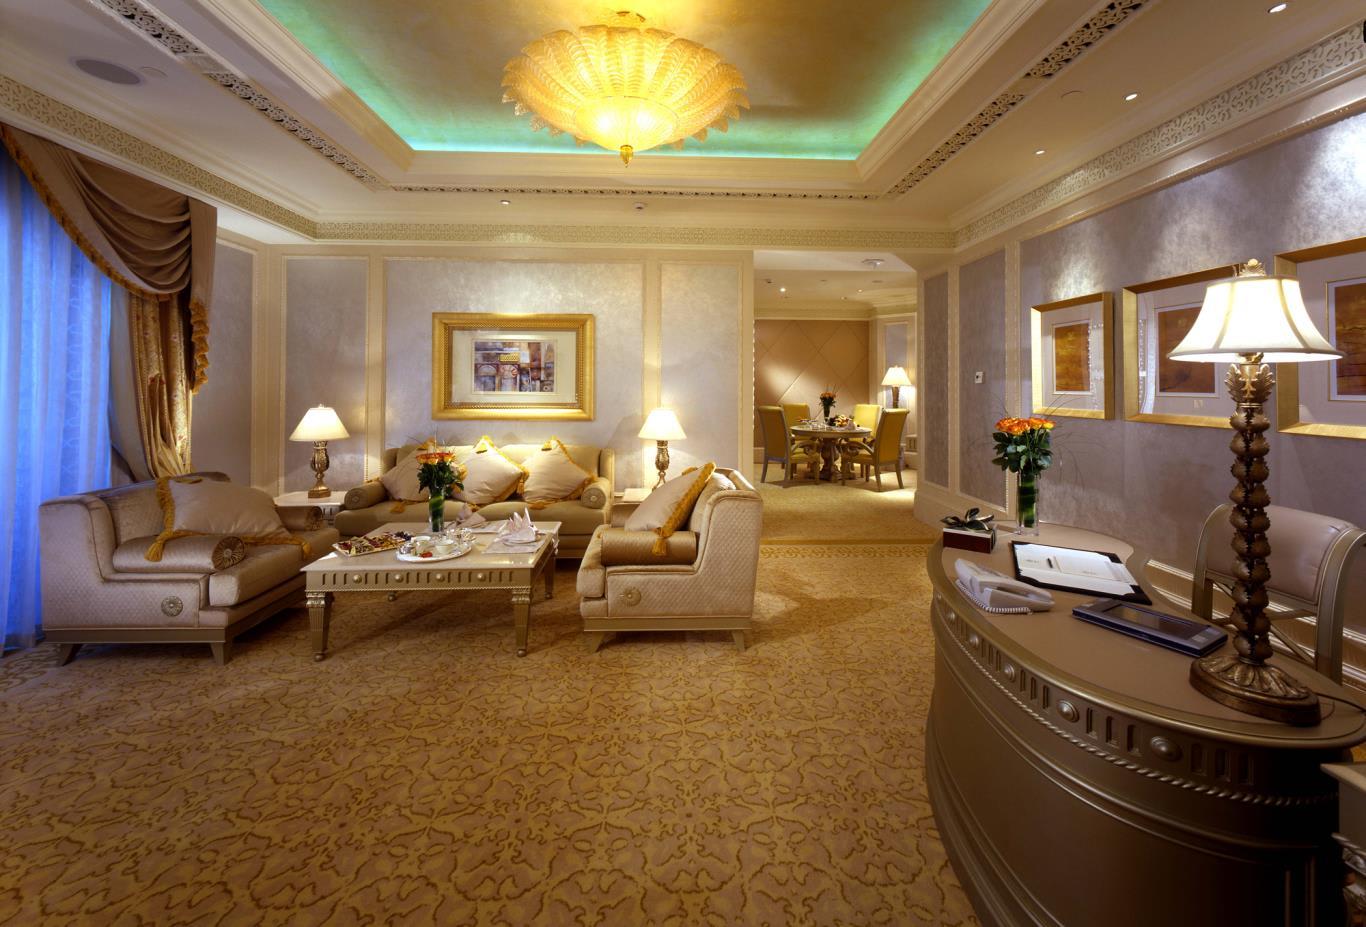 Khaleej-Deluxe-Suite-Lounge